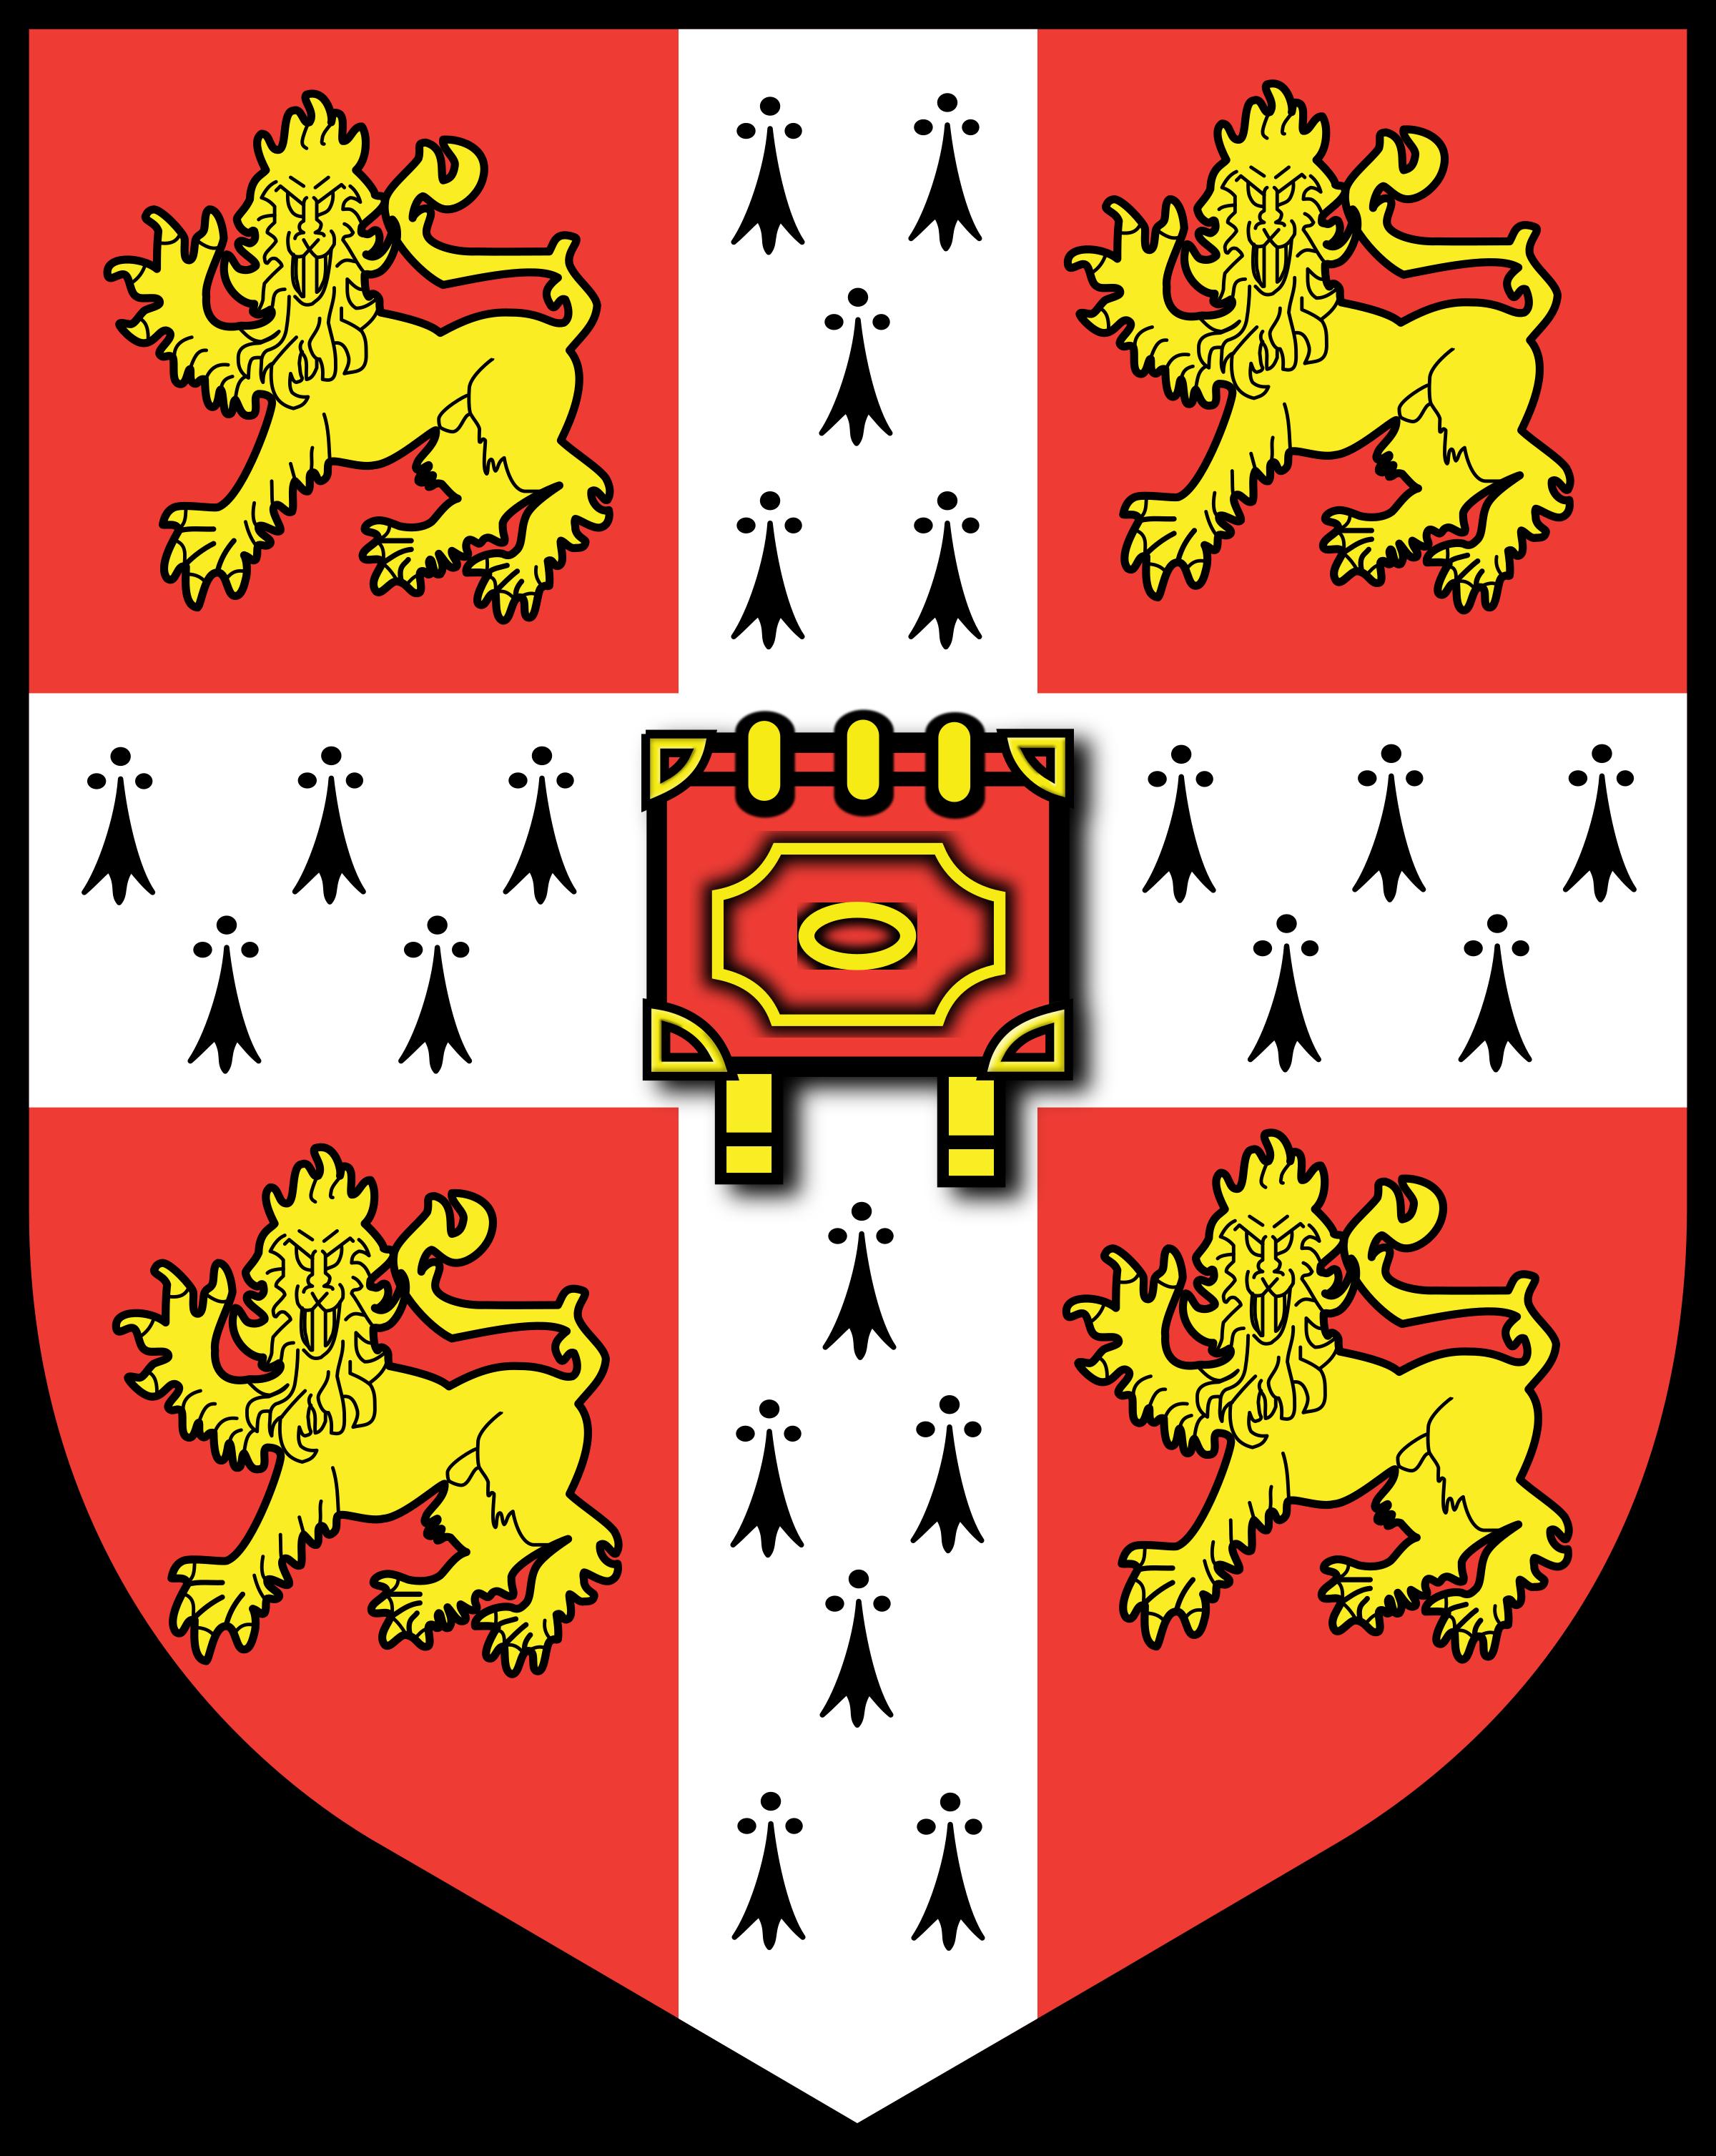 university-of-cambridge-2-logo-png-transparent.png